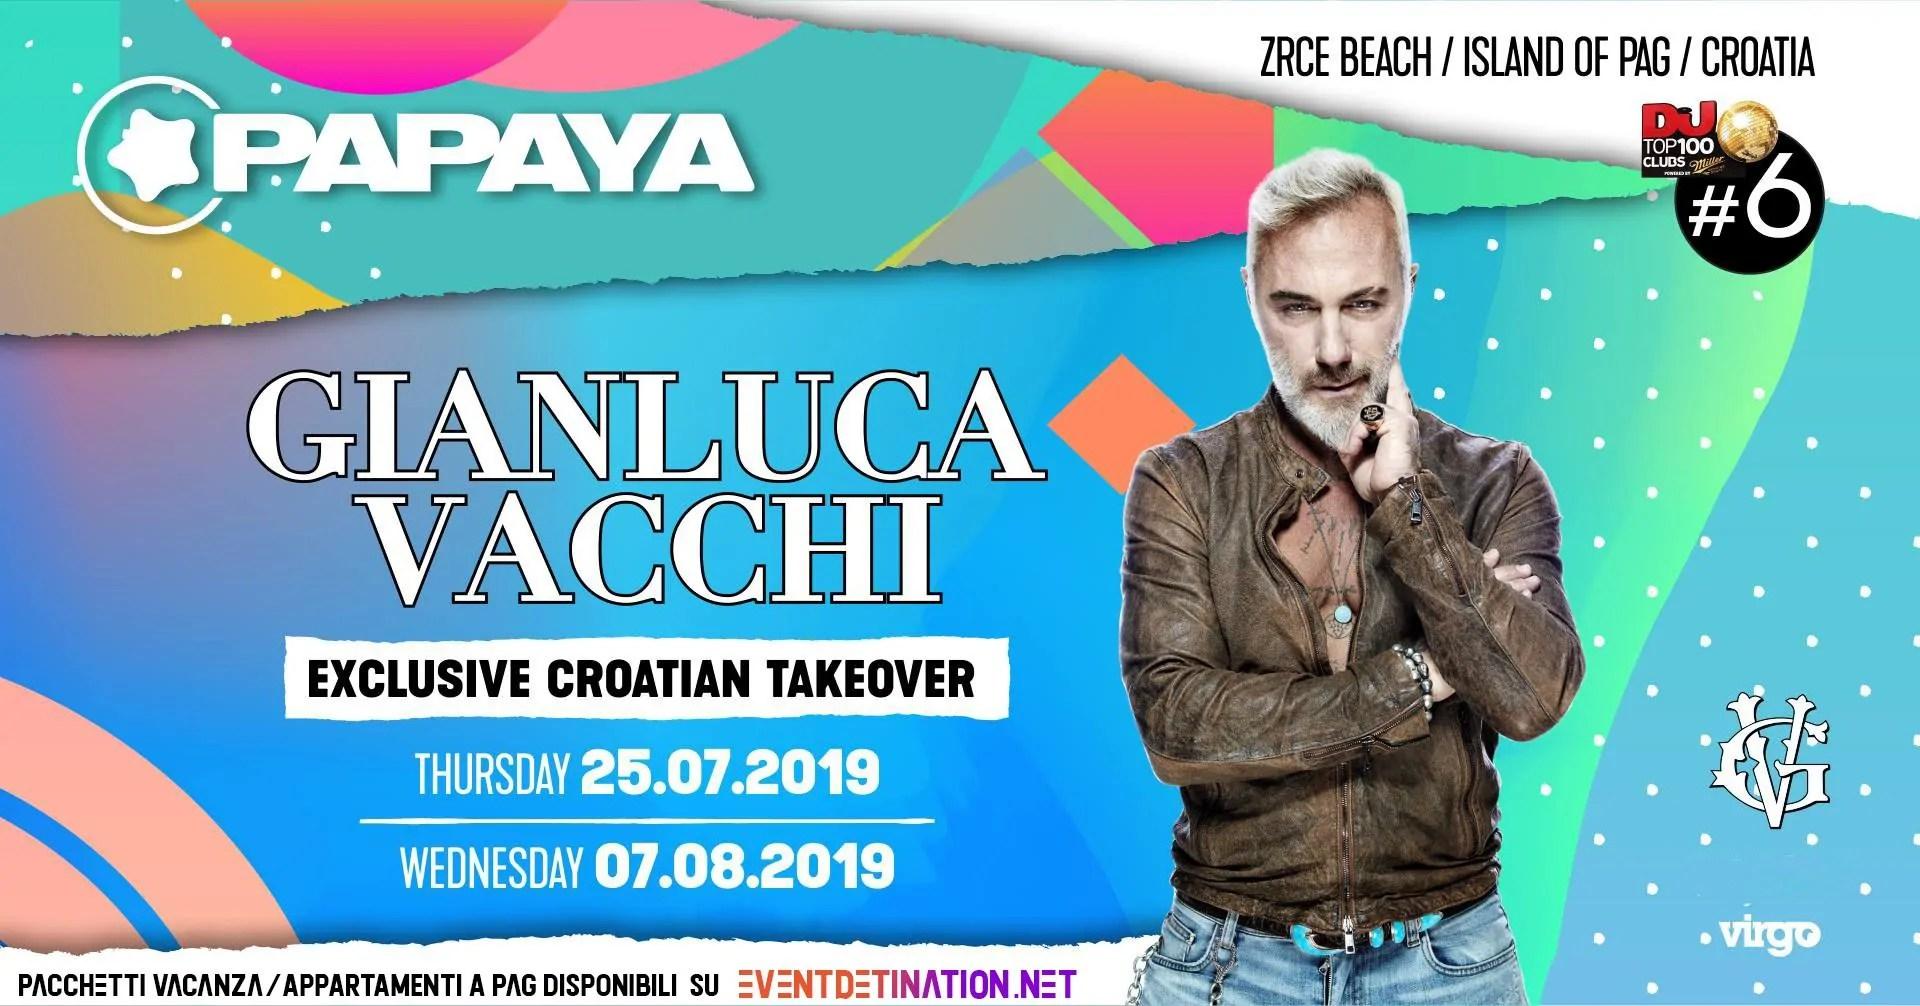 Gianluca Vacchi Papaya Club – 07 Agosto 2019 – Zrce Beach Pag Croazia | Ticket – Appartamenti – Viaggio